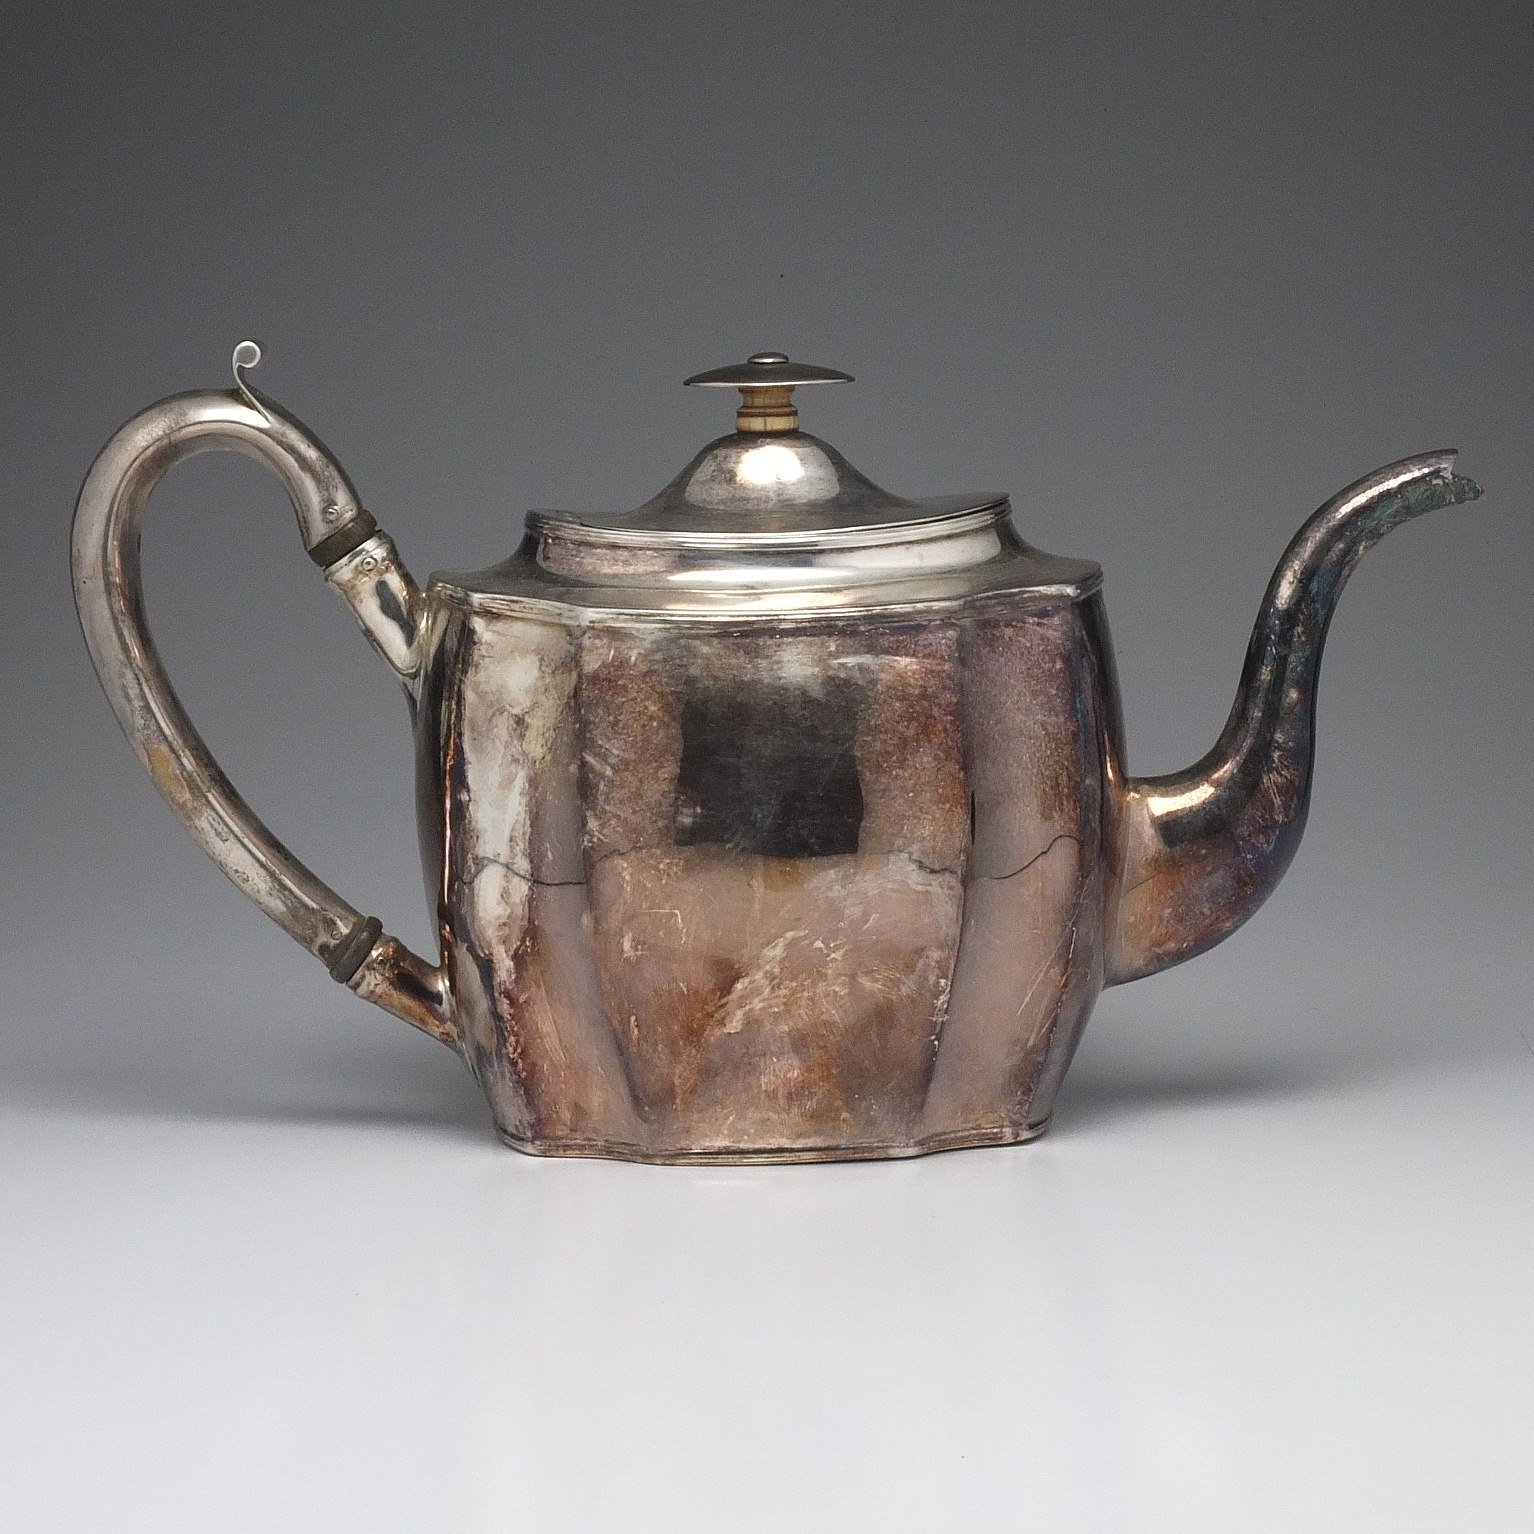 'George III Sterling Silver Teapot George Smith II & Thomas Hayter London 1804'